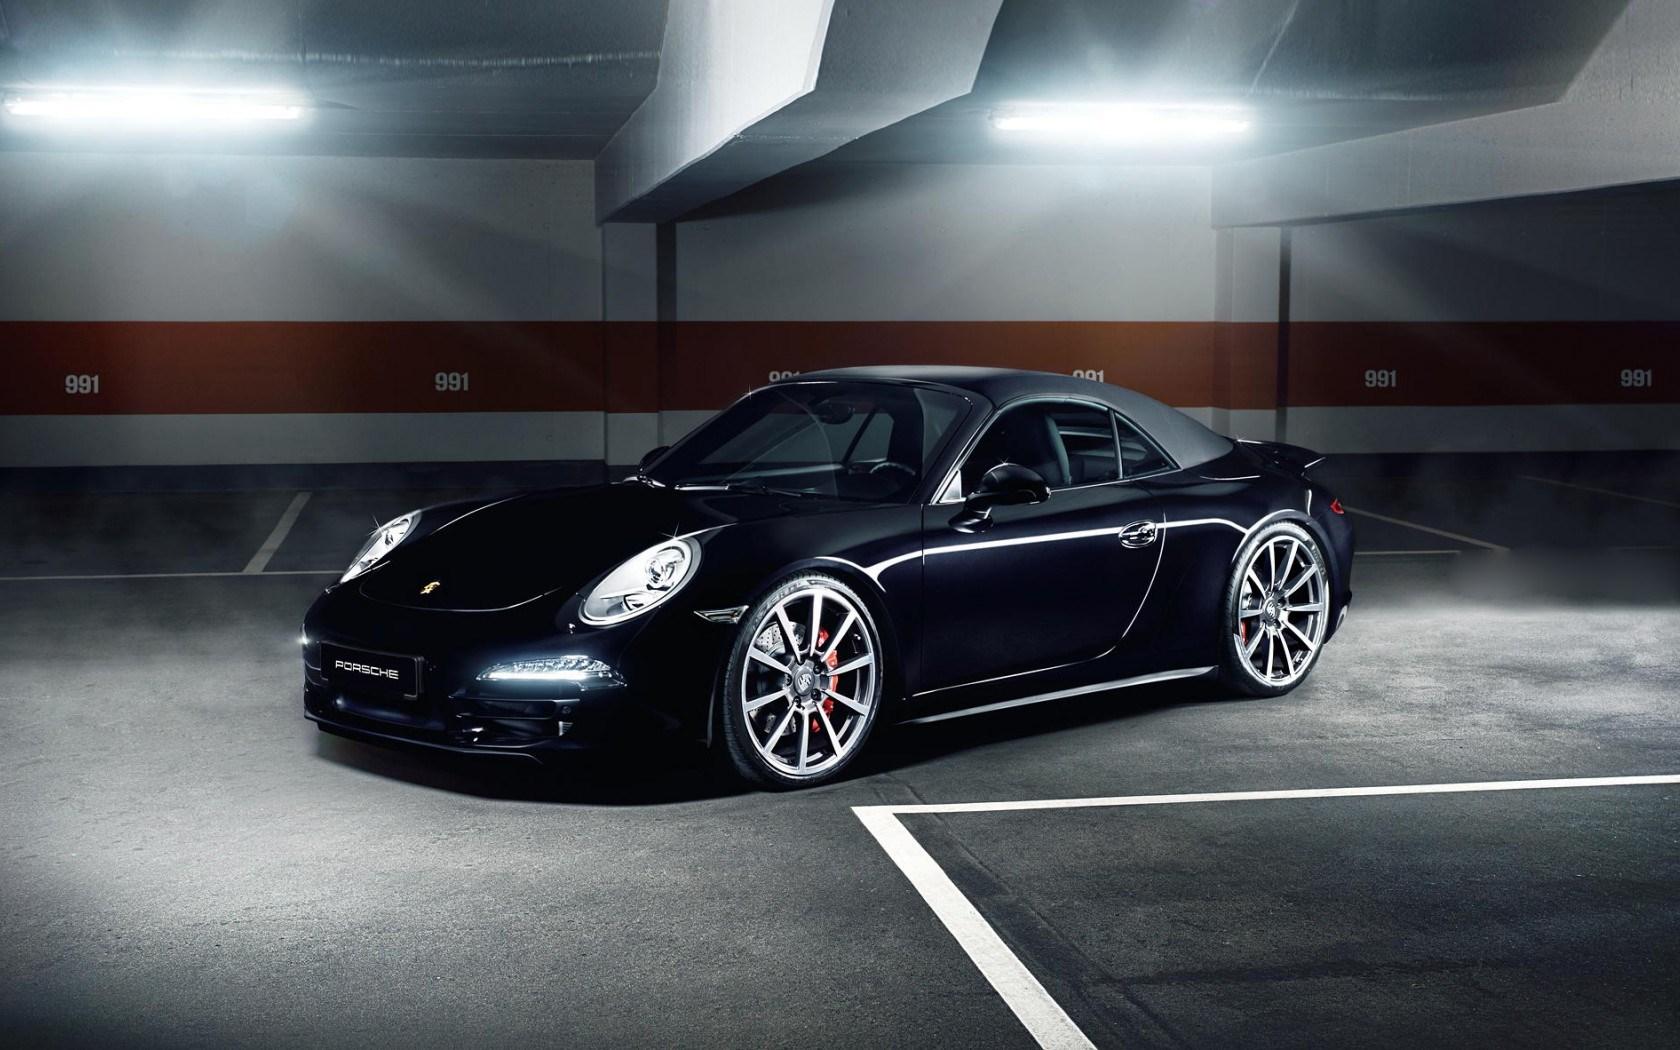 Porsche 991 Carrera Car Wheels Tuning